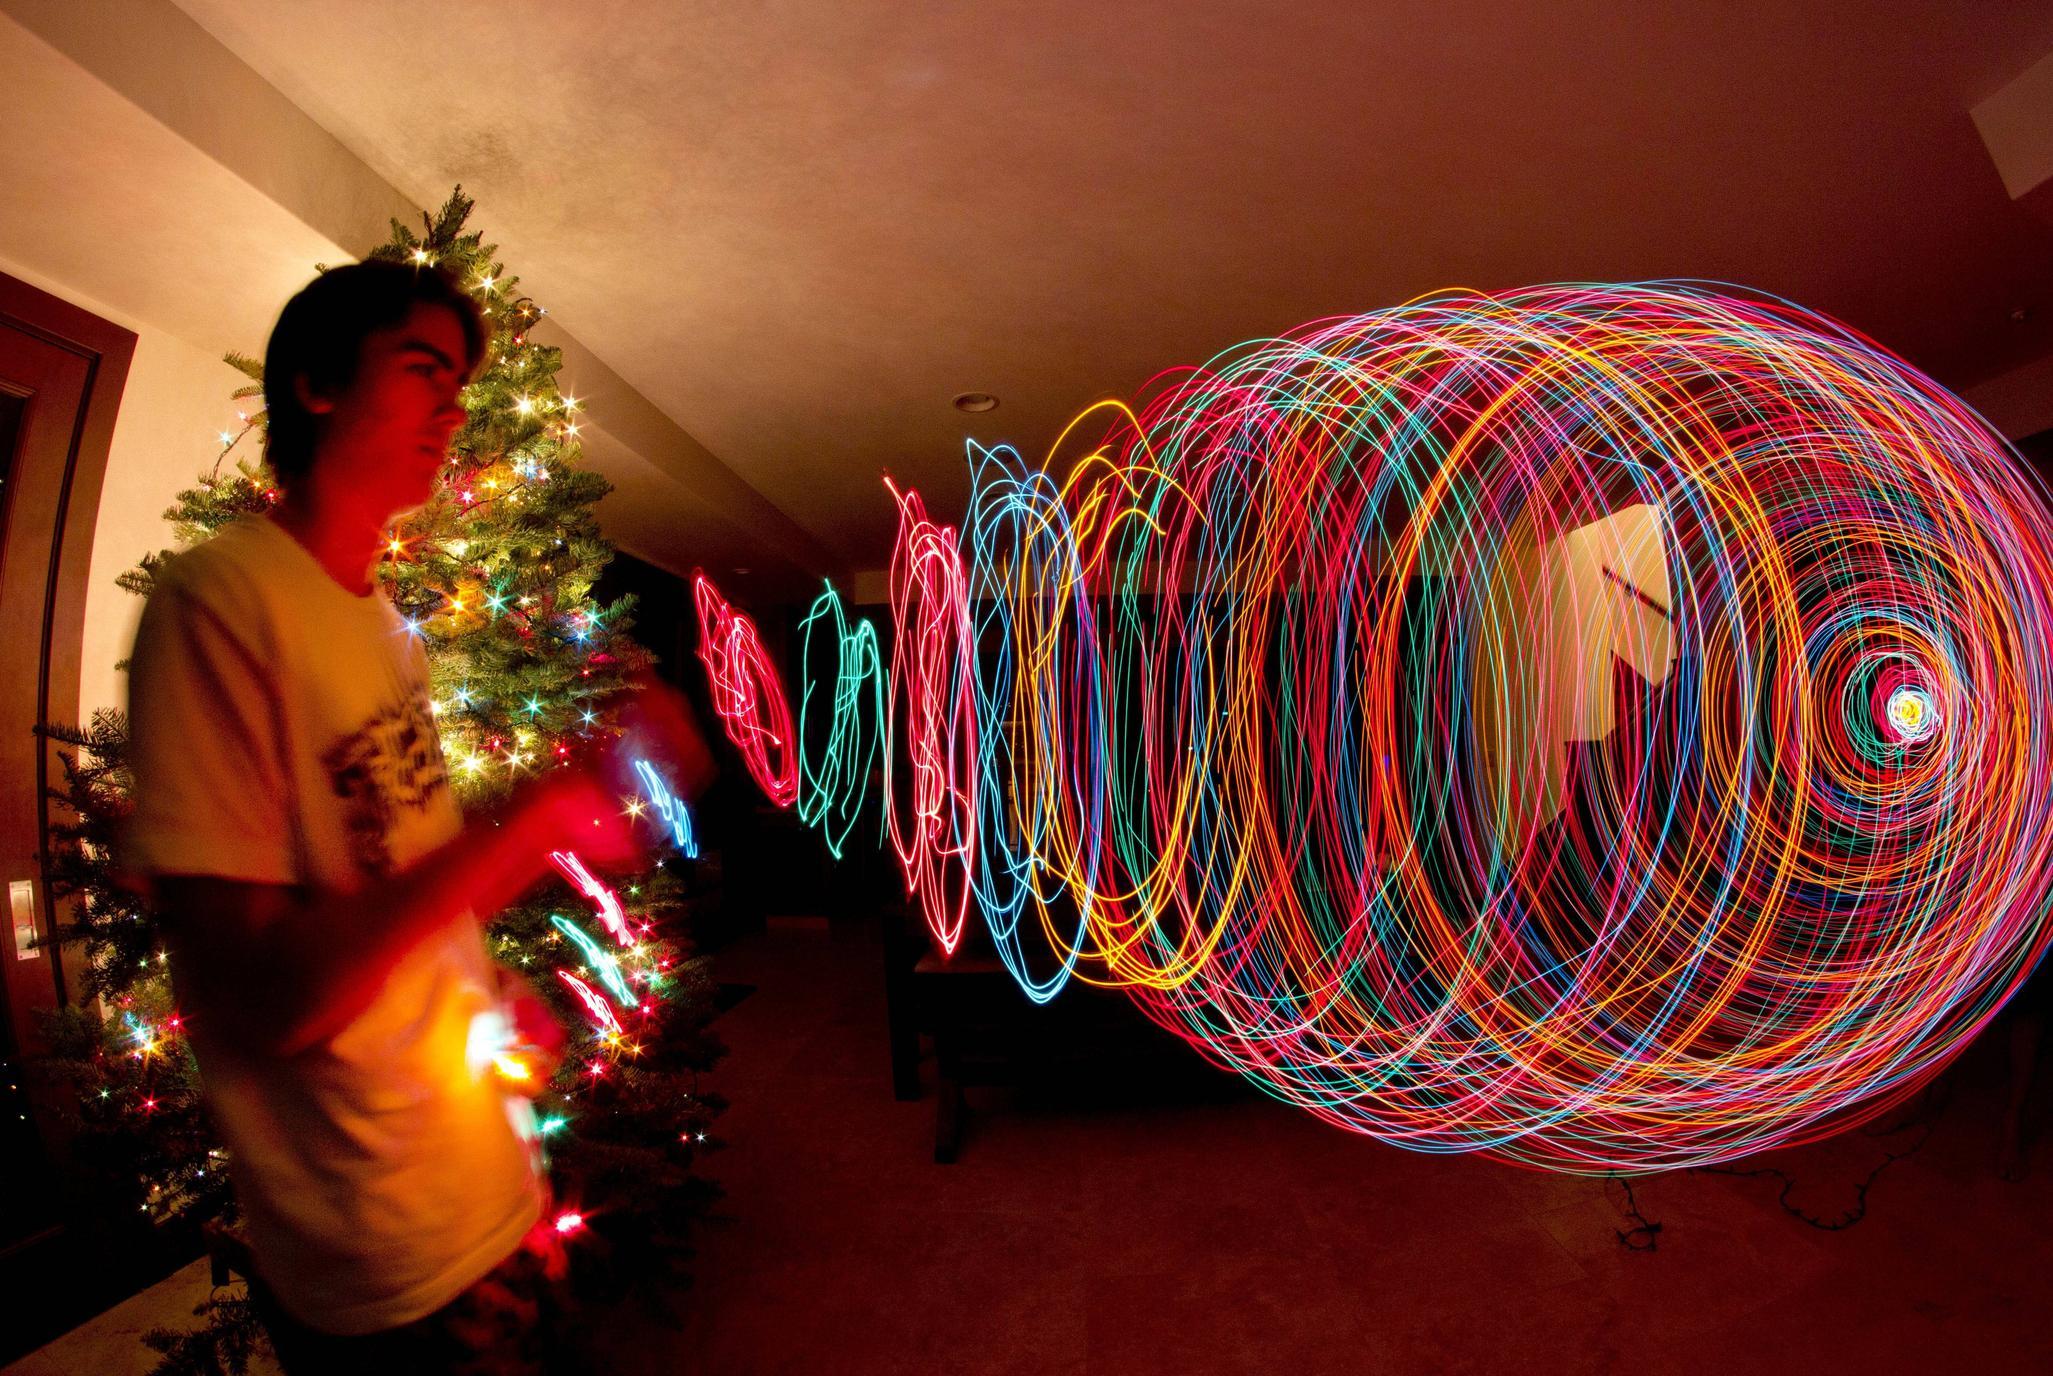 light-painting-spirales